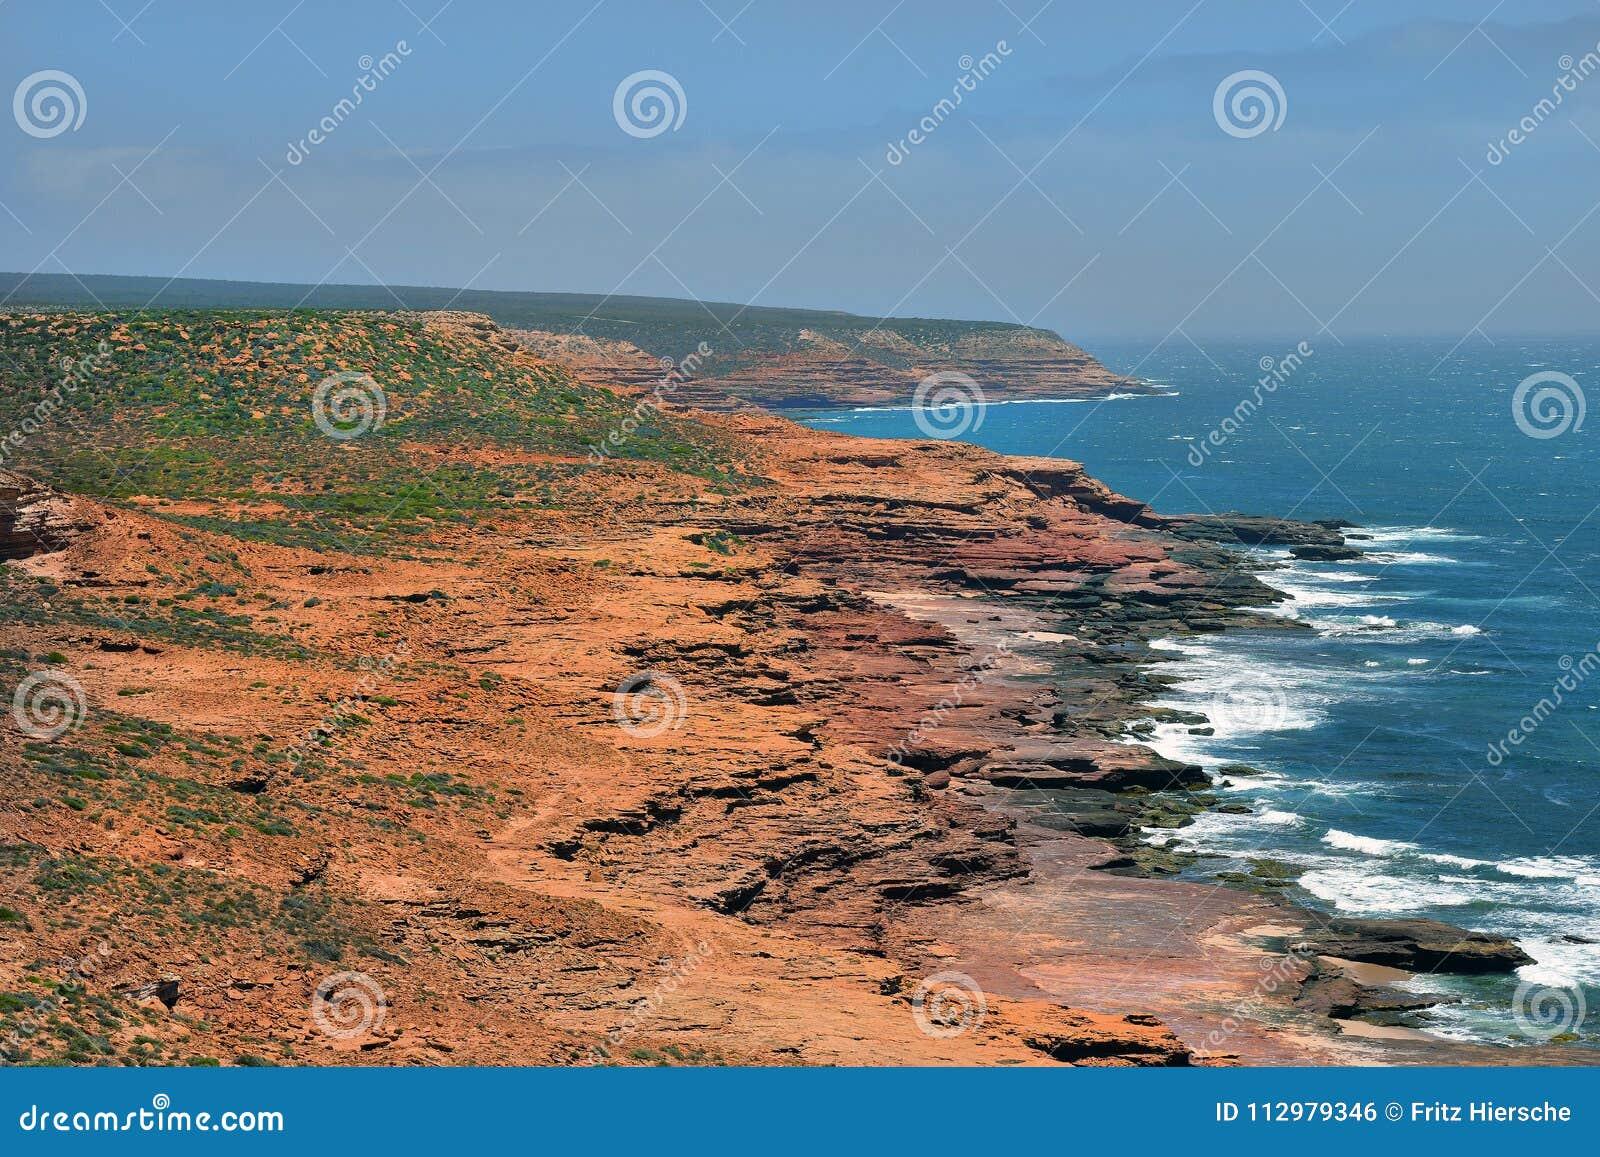 Australia, WA, Kalbarri NP on Indian Ocean